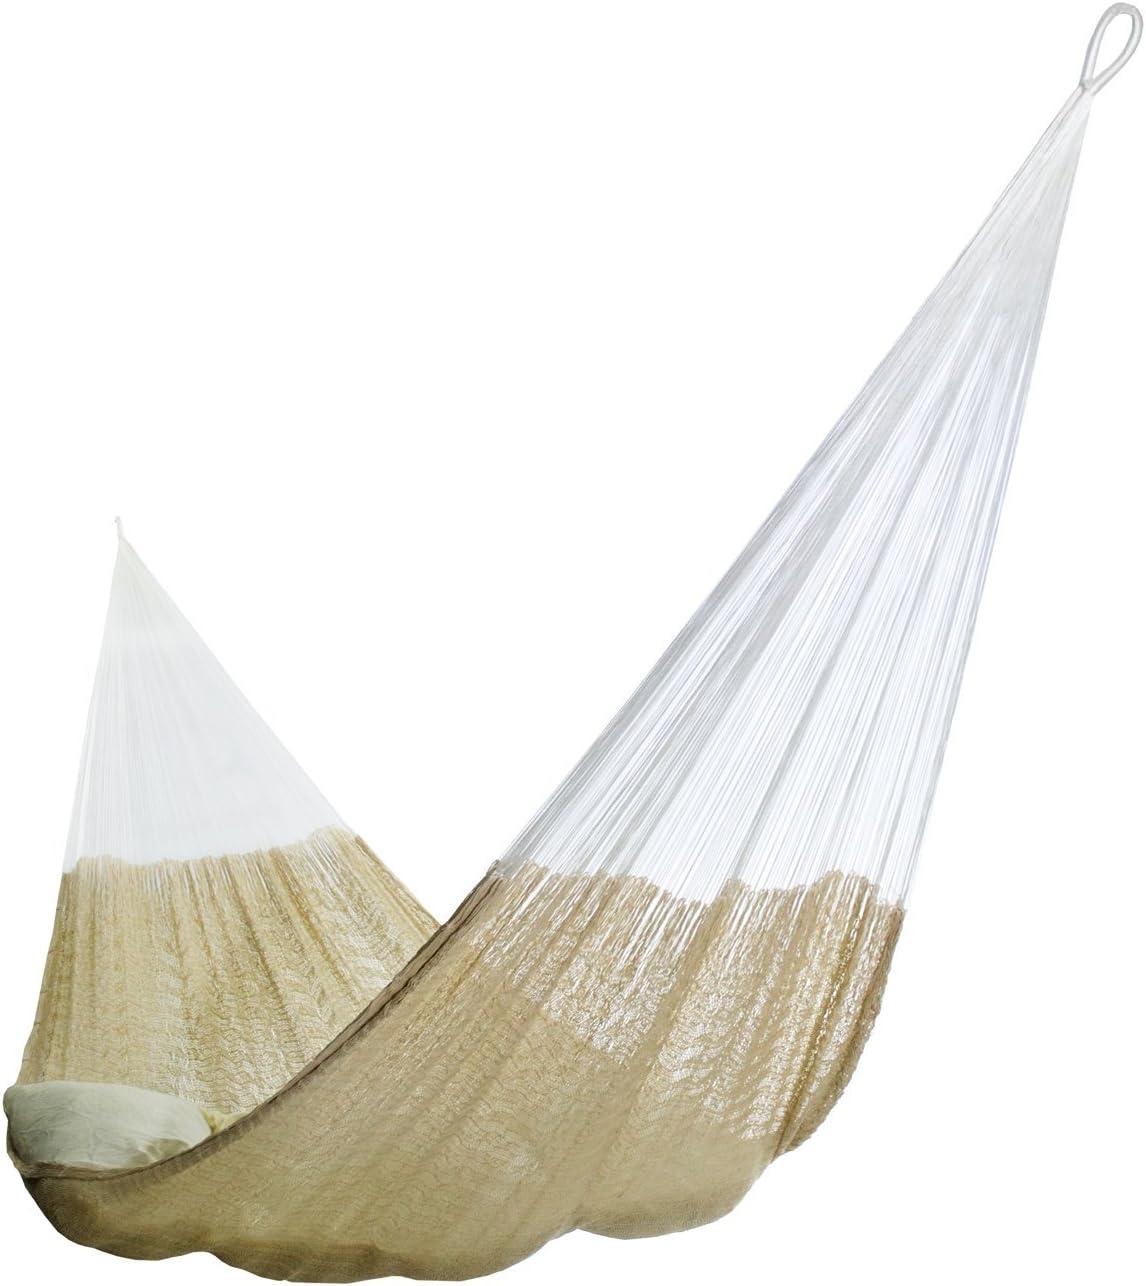 Hammocks Rada- Handmade Yucatan Hammock – Matrimonial Size Natural Color – 13ft Long Artisan Crafted